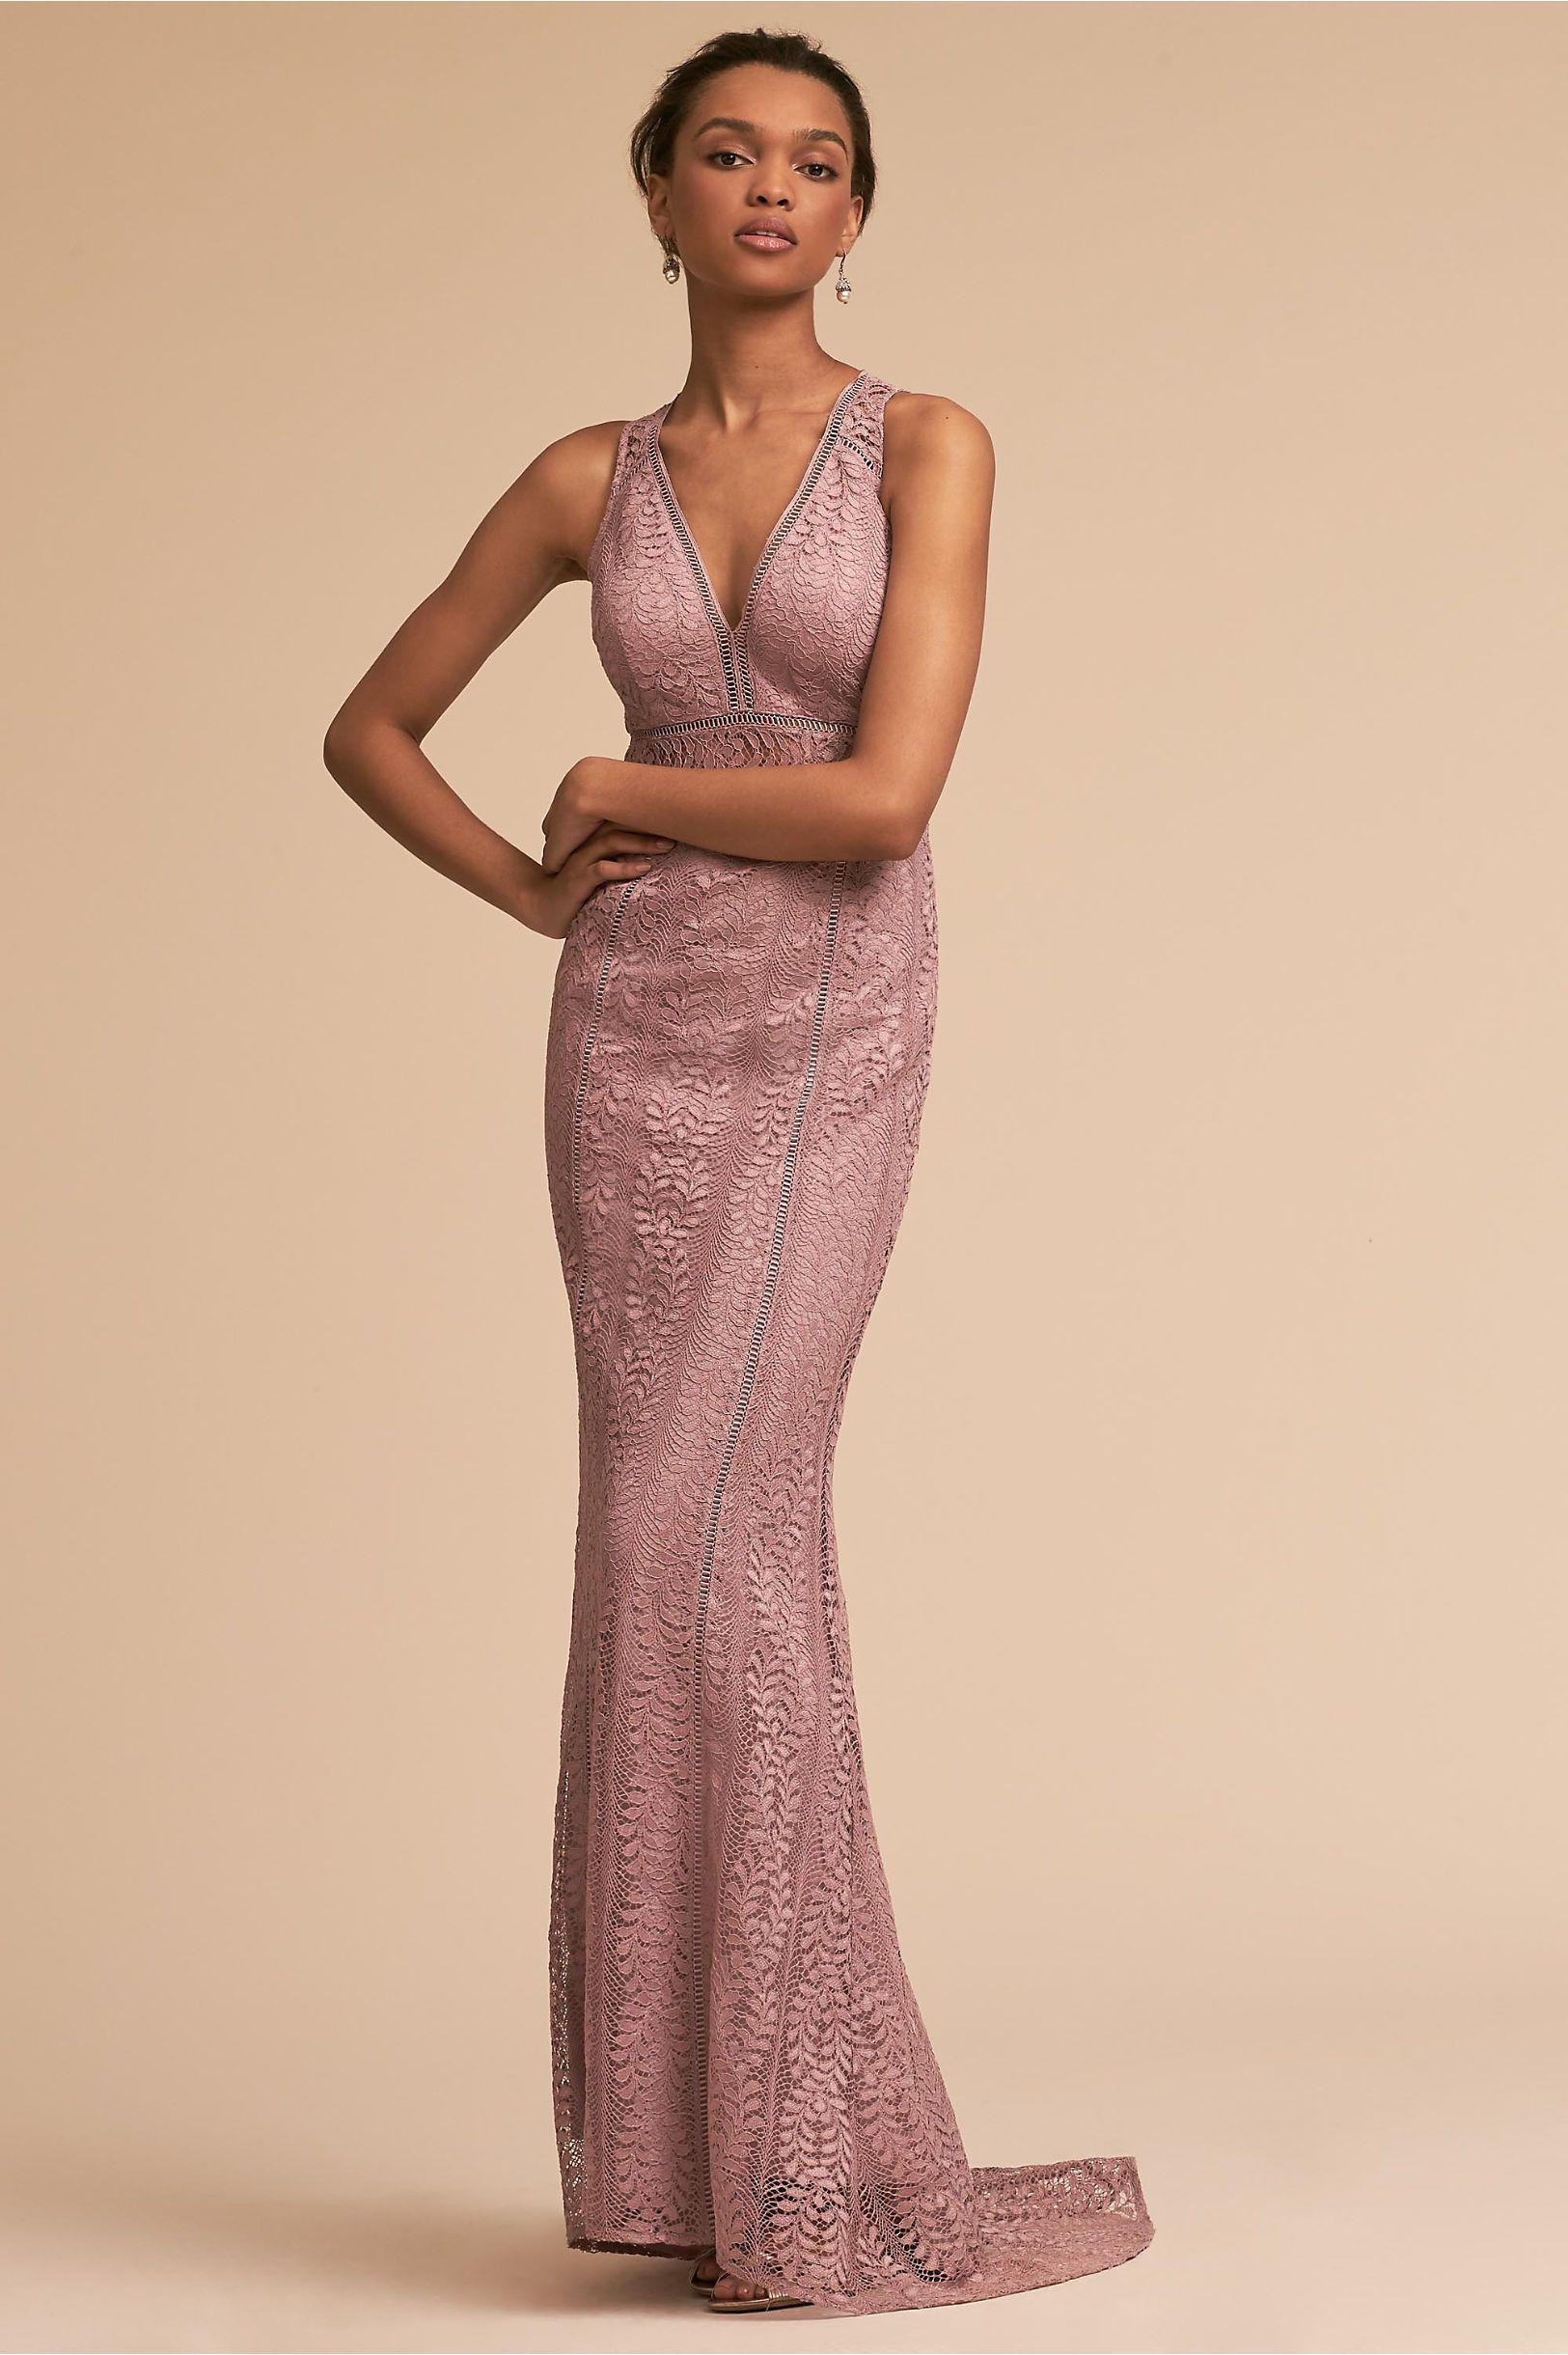 100 dollar wedding dress  BHLDNus Connor Dress in Mauve  Mauve Bridal parties and Wedding dress